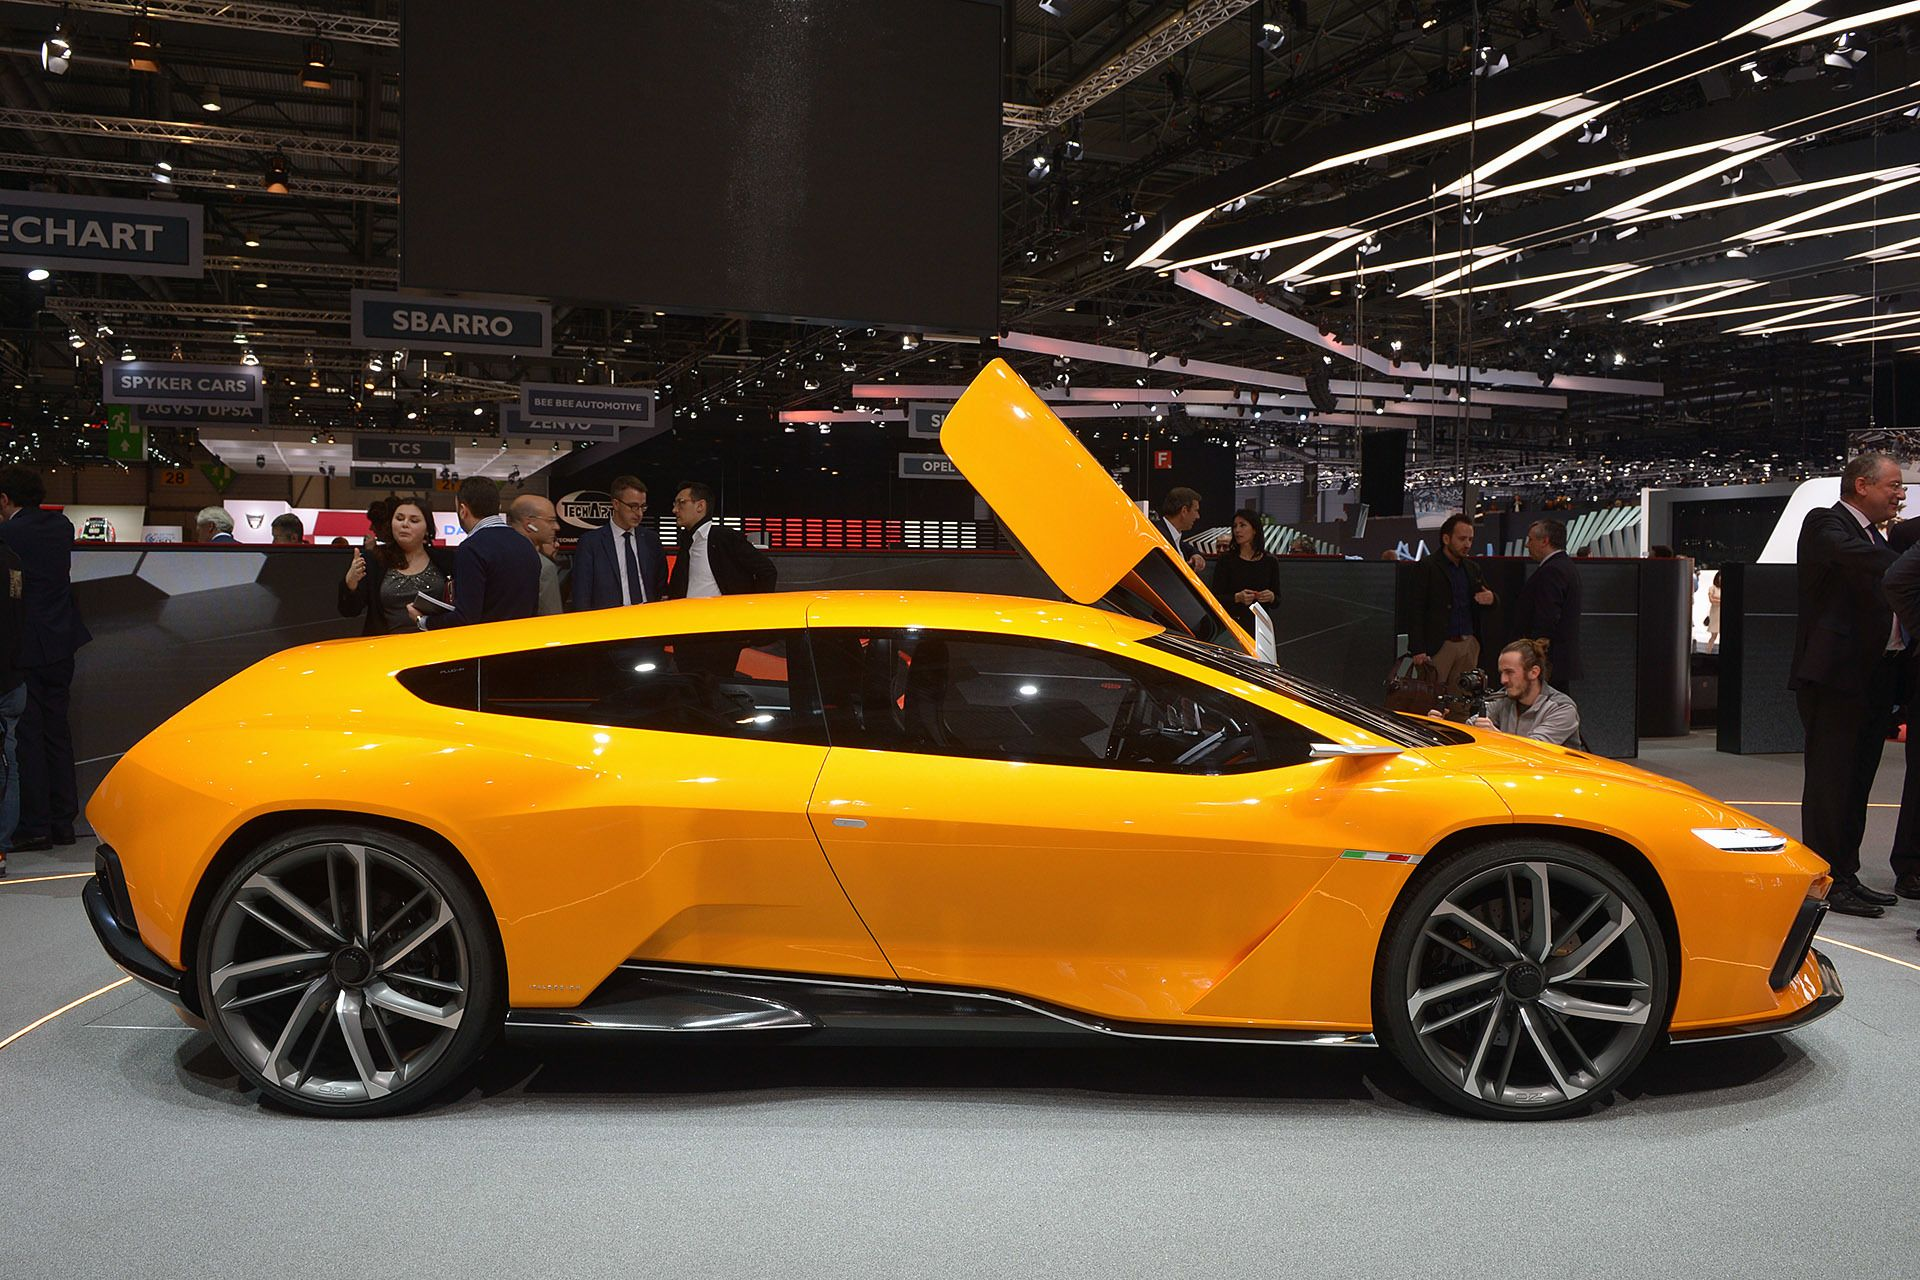 Italdesign Gtzero Concept Geneva 2016 Photo Gallery In 2020 Concept Cars Geneva Motor Show Volkswagen Car